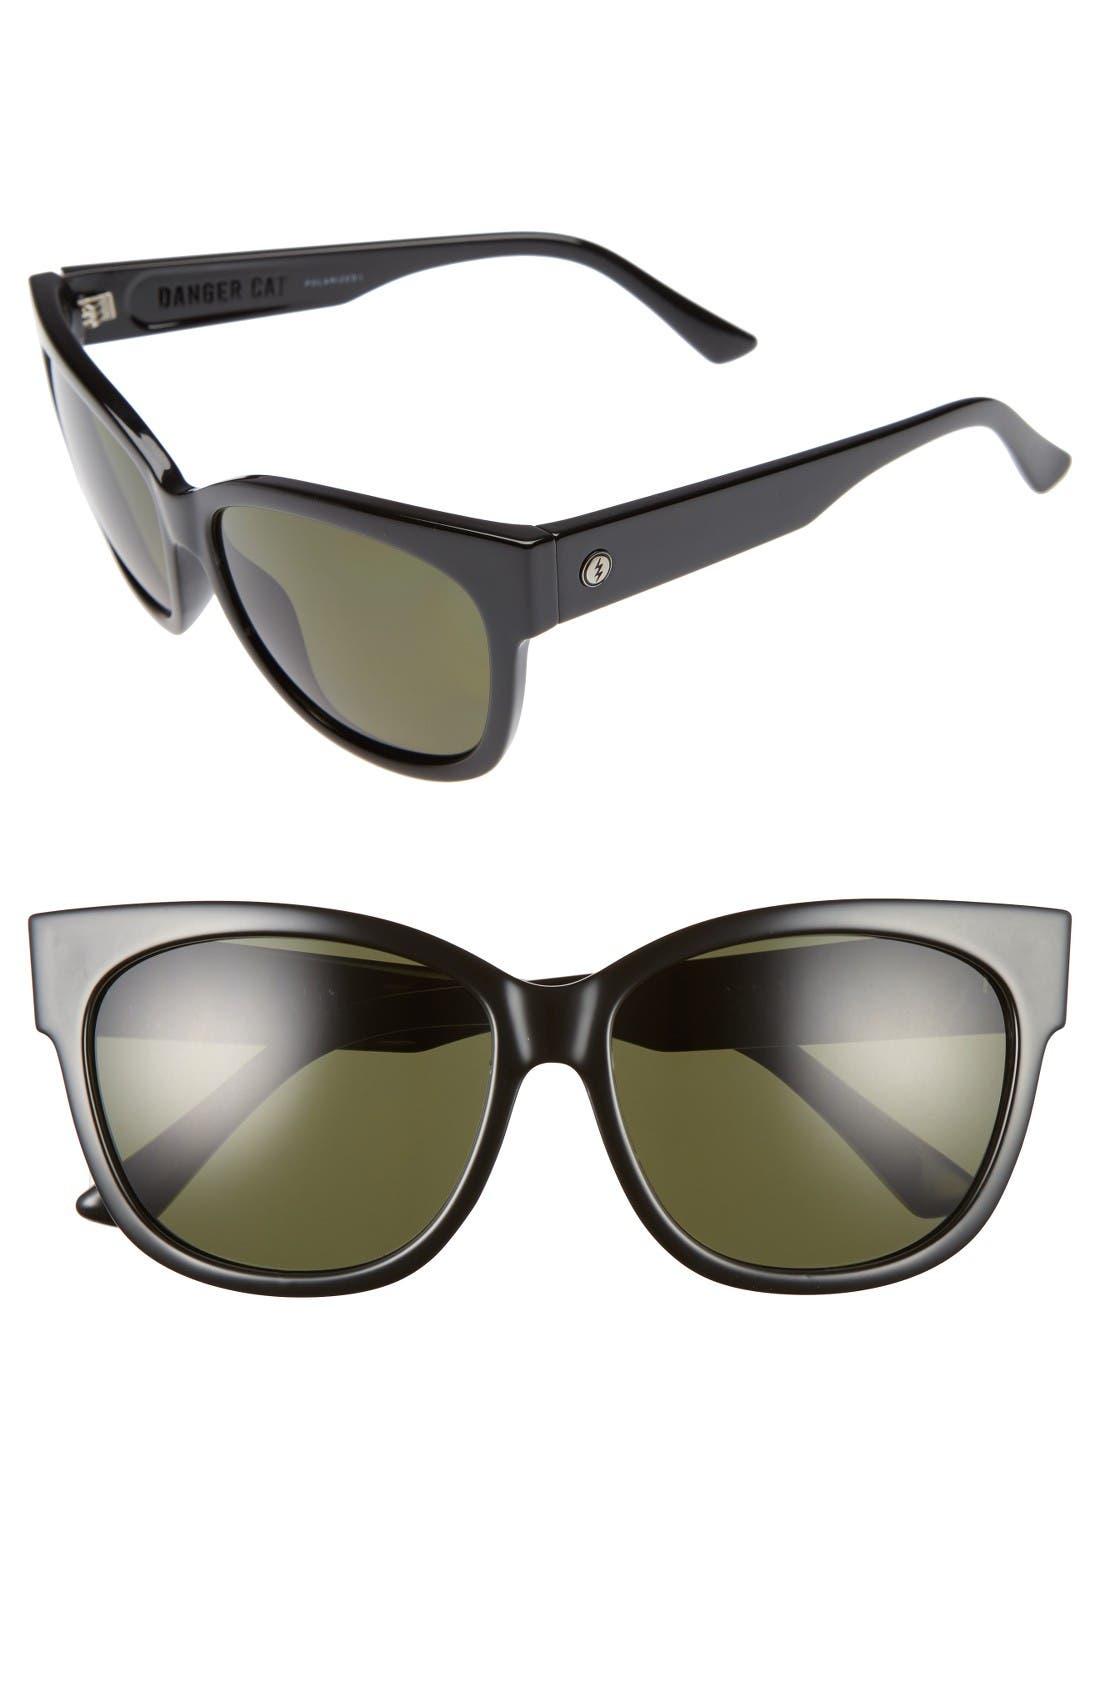 Danger Cat 58mm Sunglasses,                         Main,                         color, Gloss Black/ Polarized Grey